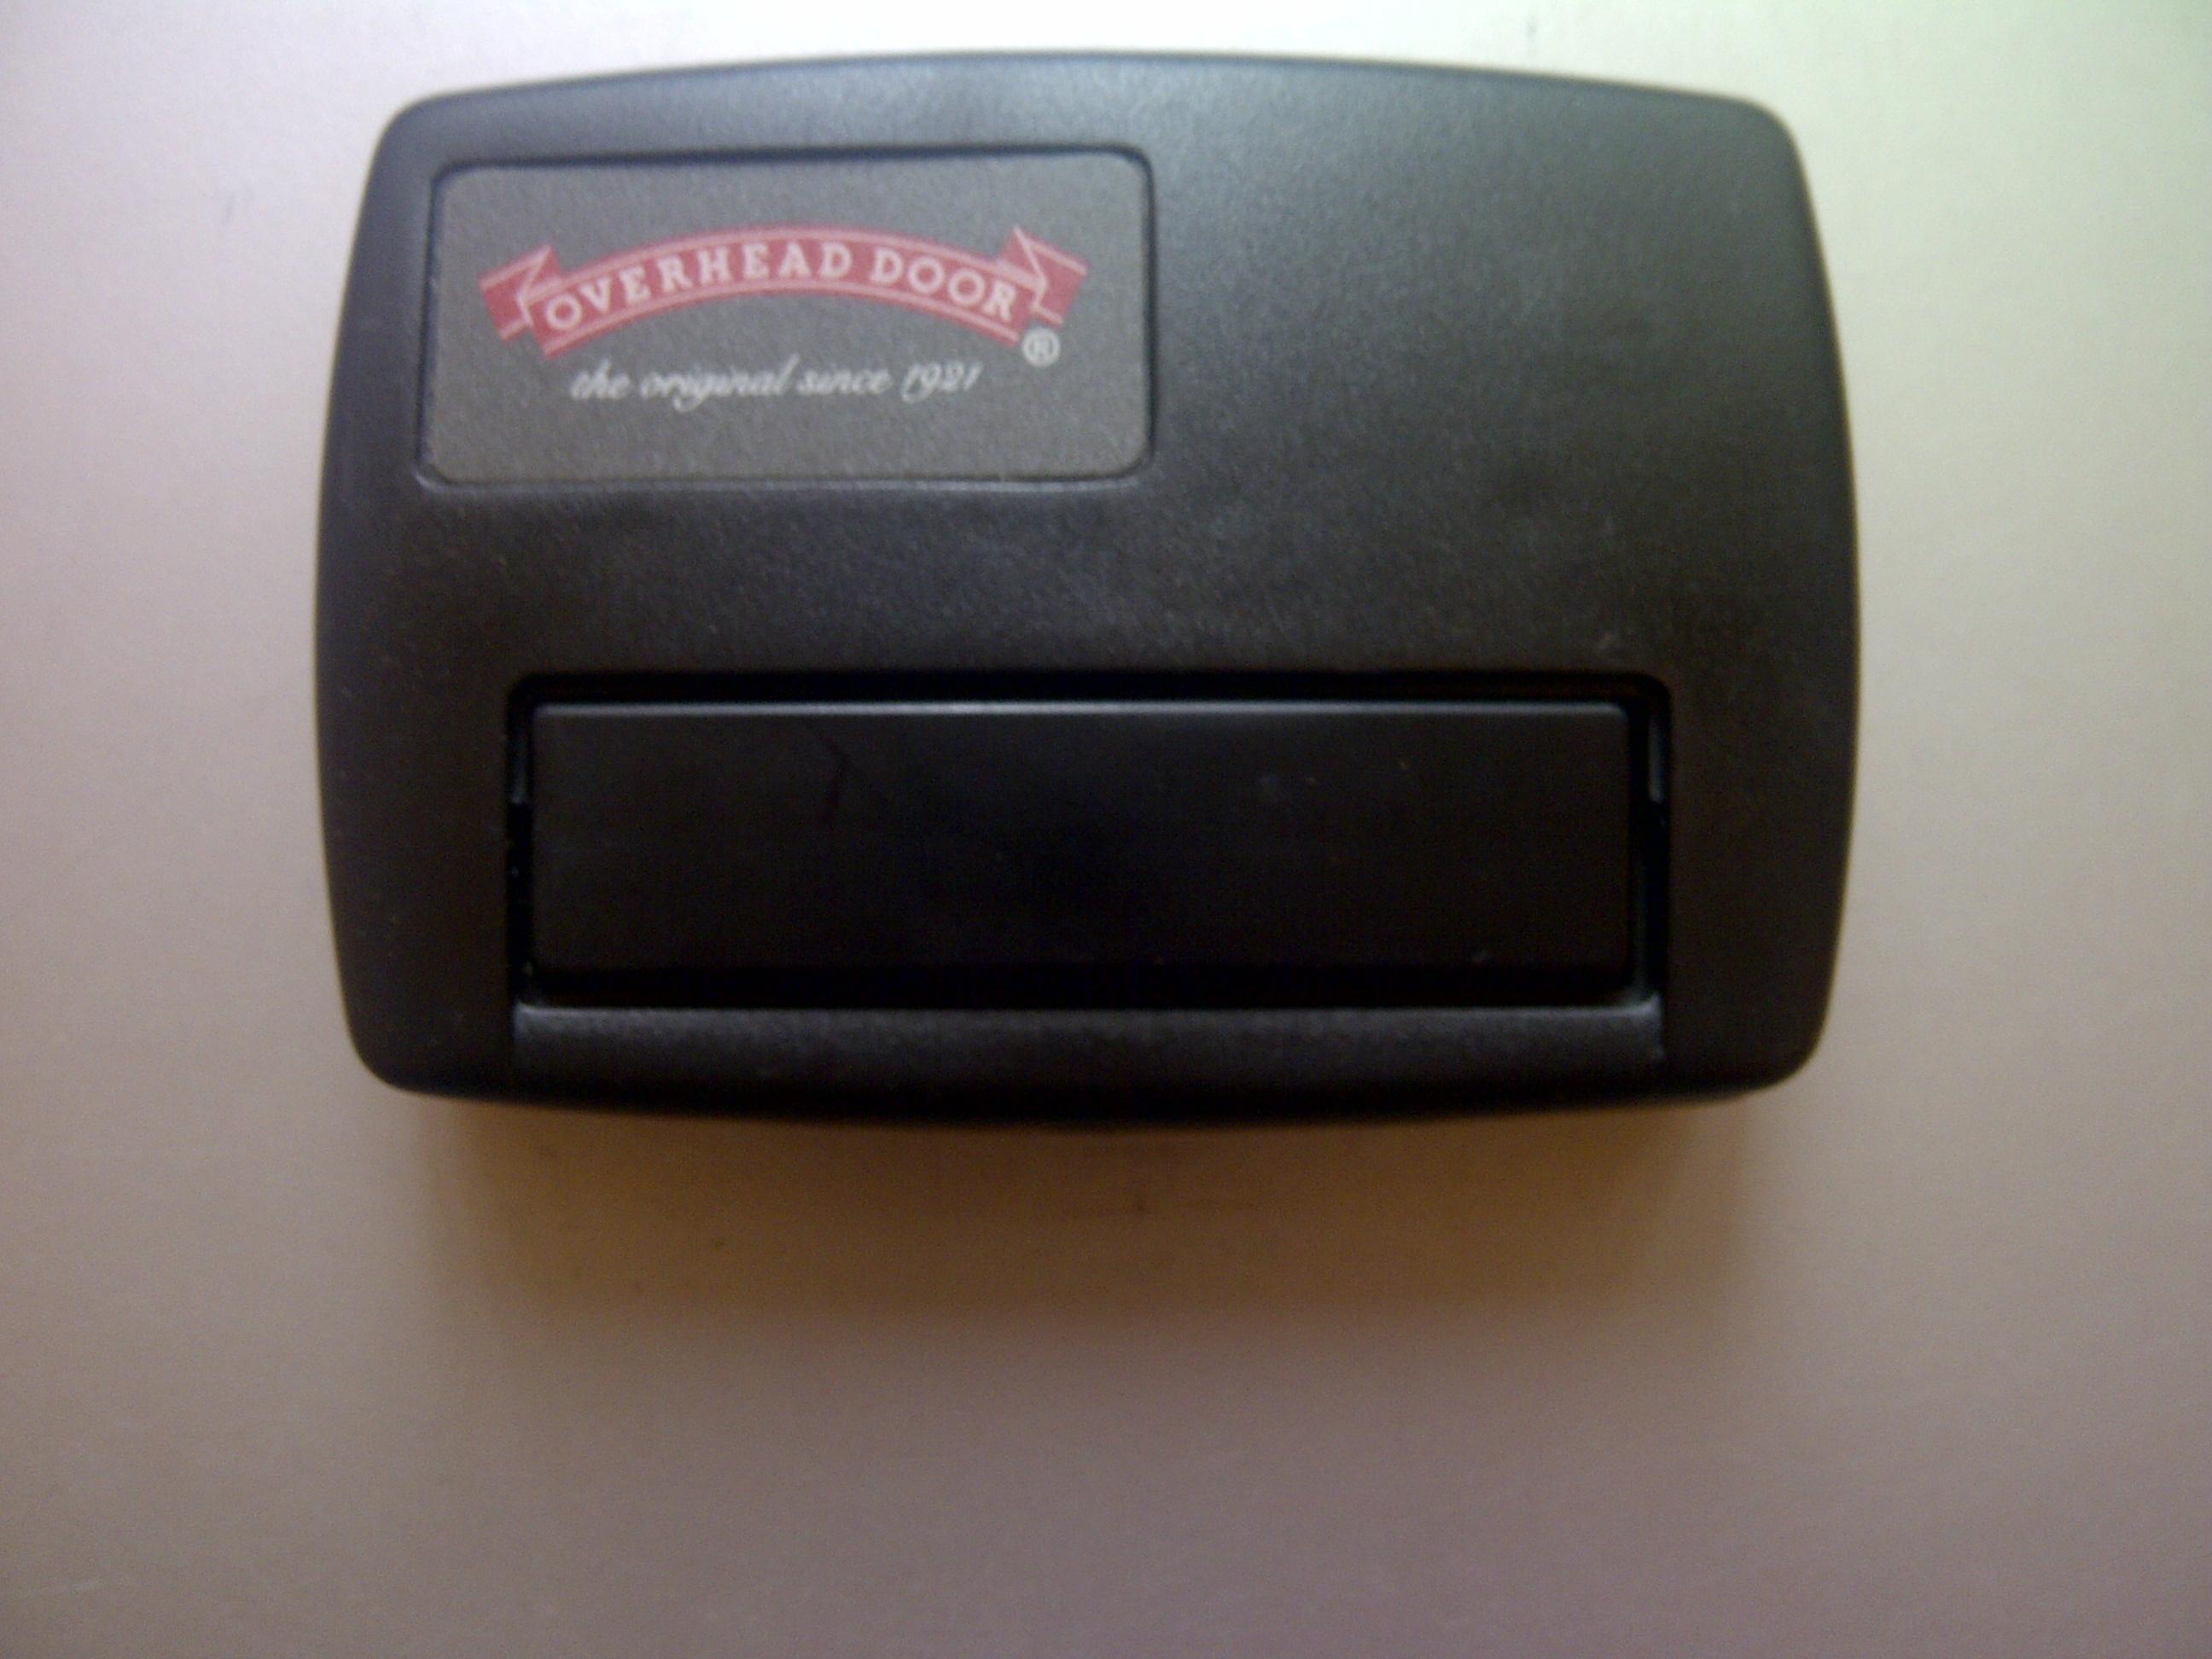 & My Overhead Door Opener Doesn\u0027t Work with this Universal Remote